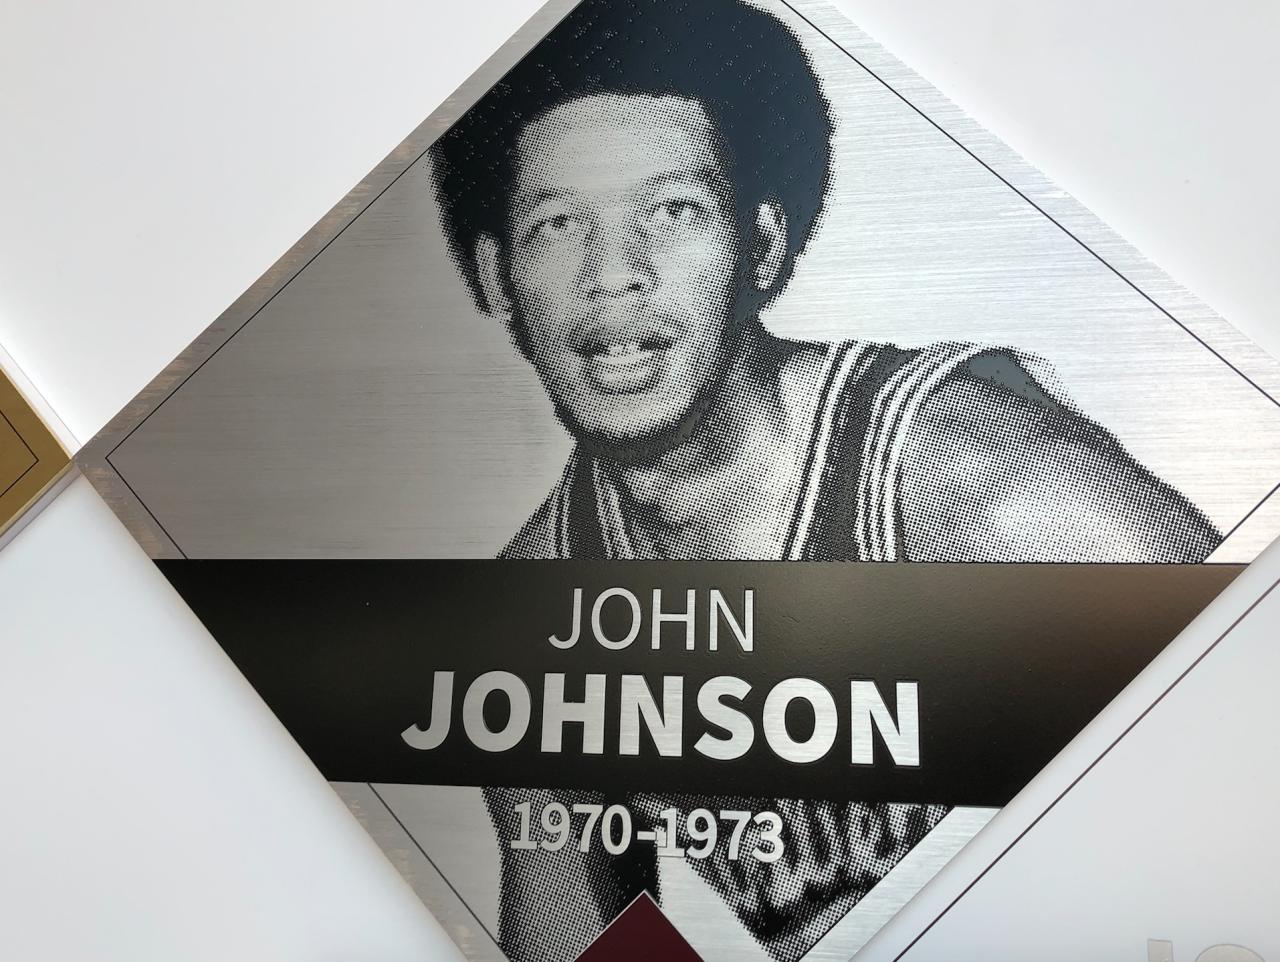 John Johnson Wall of Fame